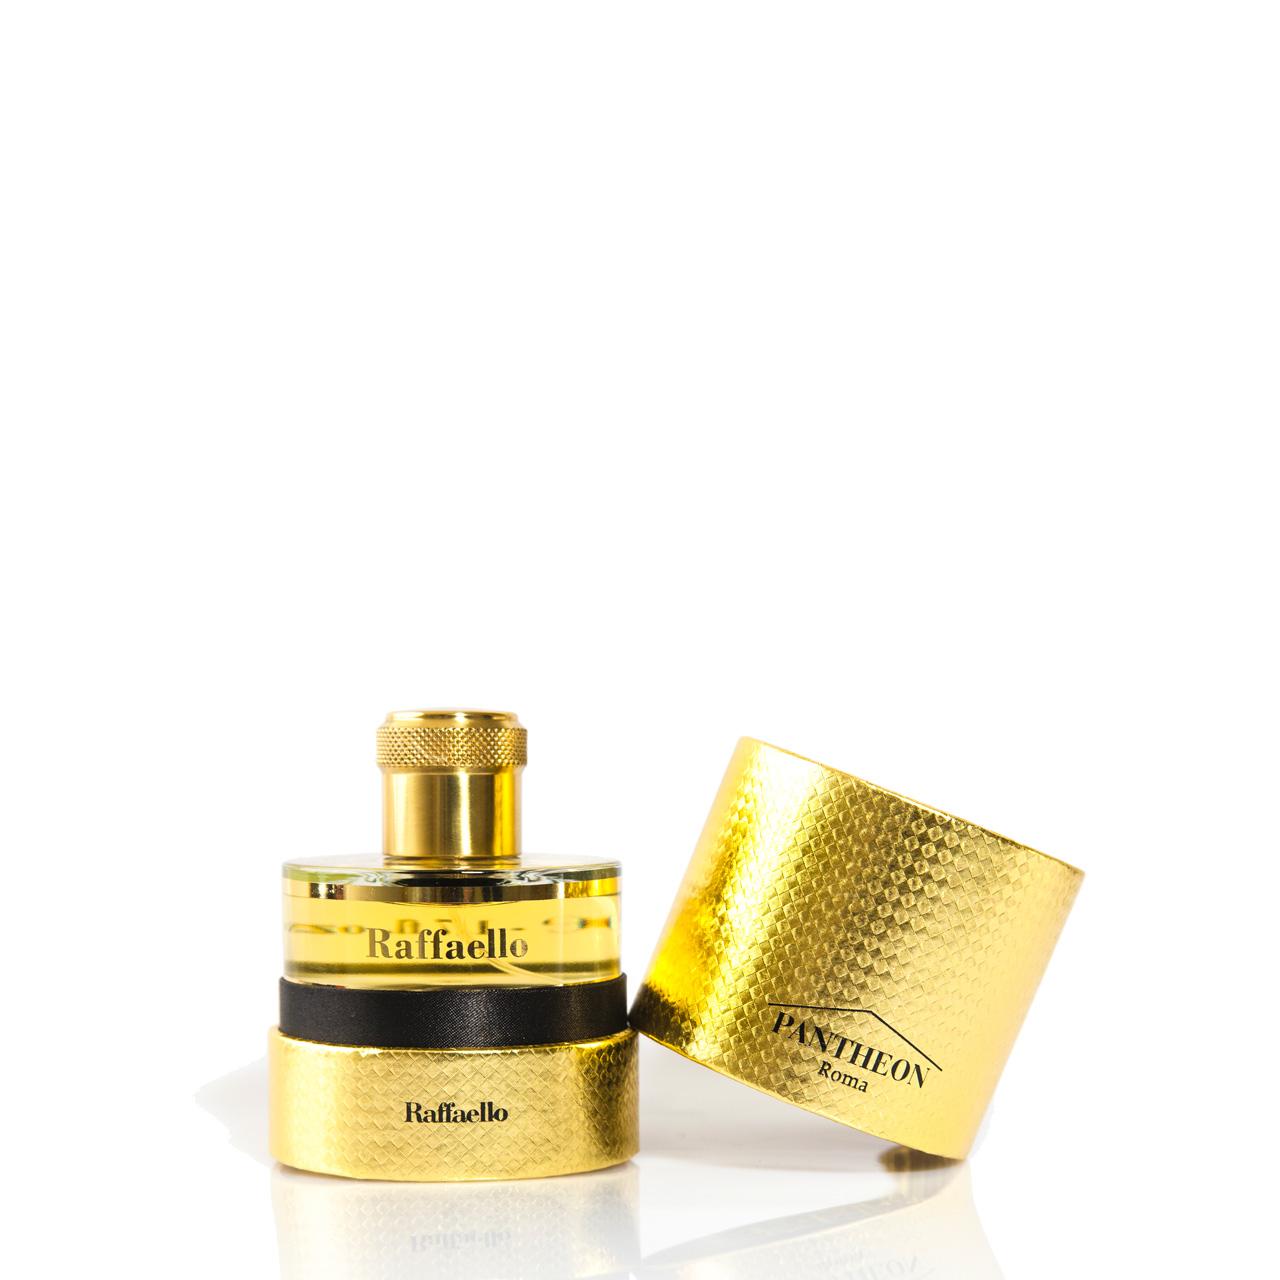 Raffaello - Eau de Parfum